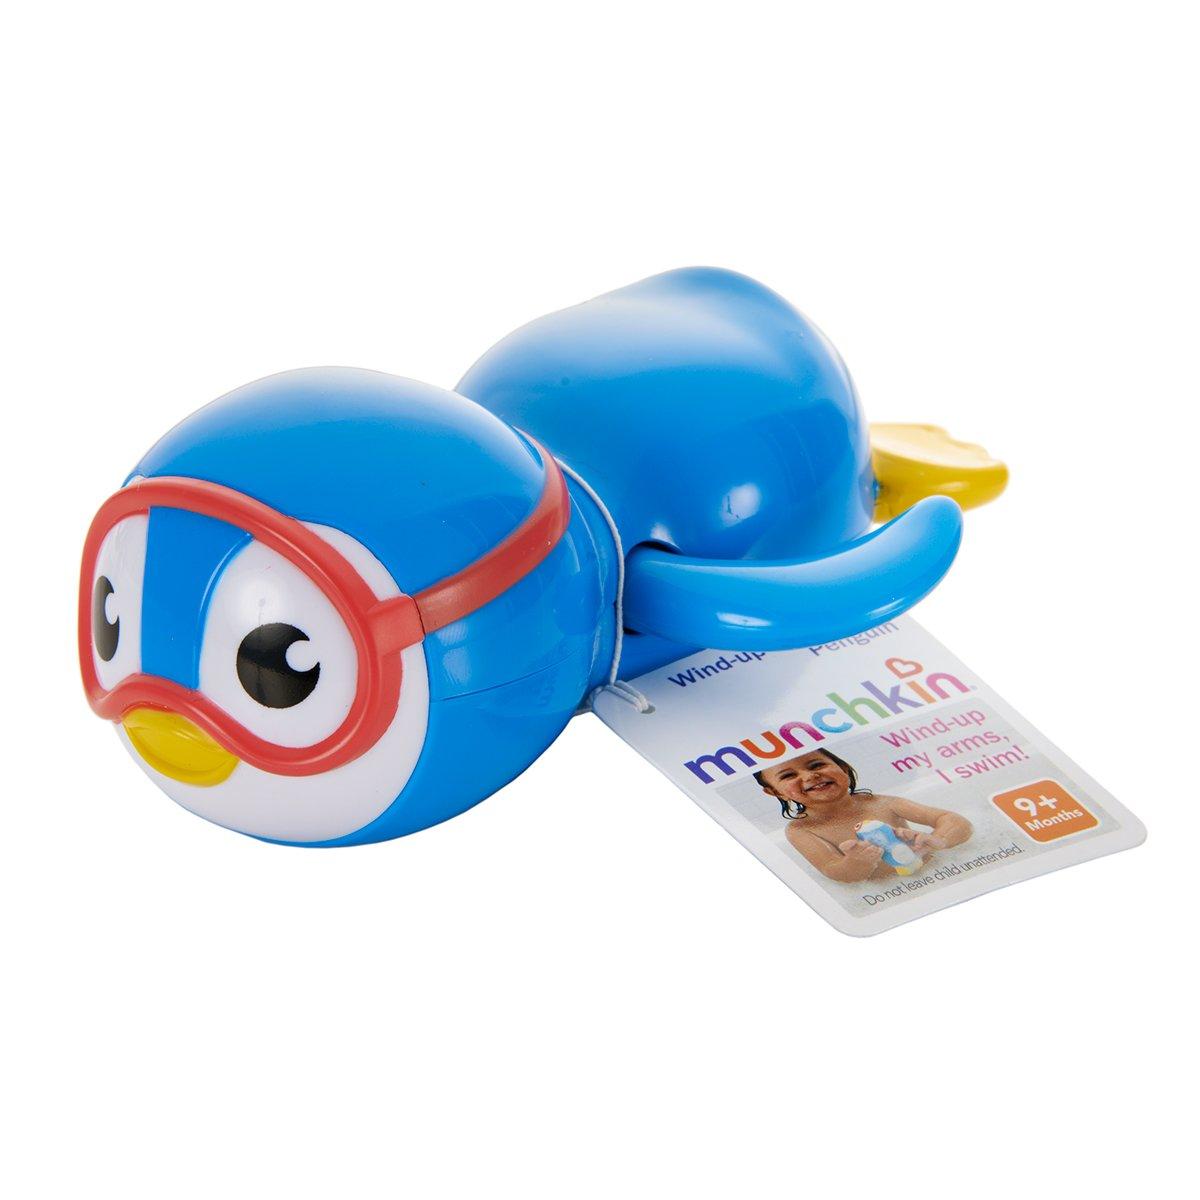 Amazon.com : Munchkin Wind Up Swimming Penguin Bath Toy, Blue : Baby